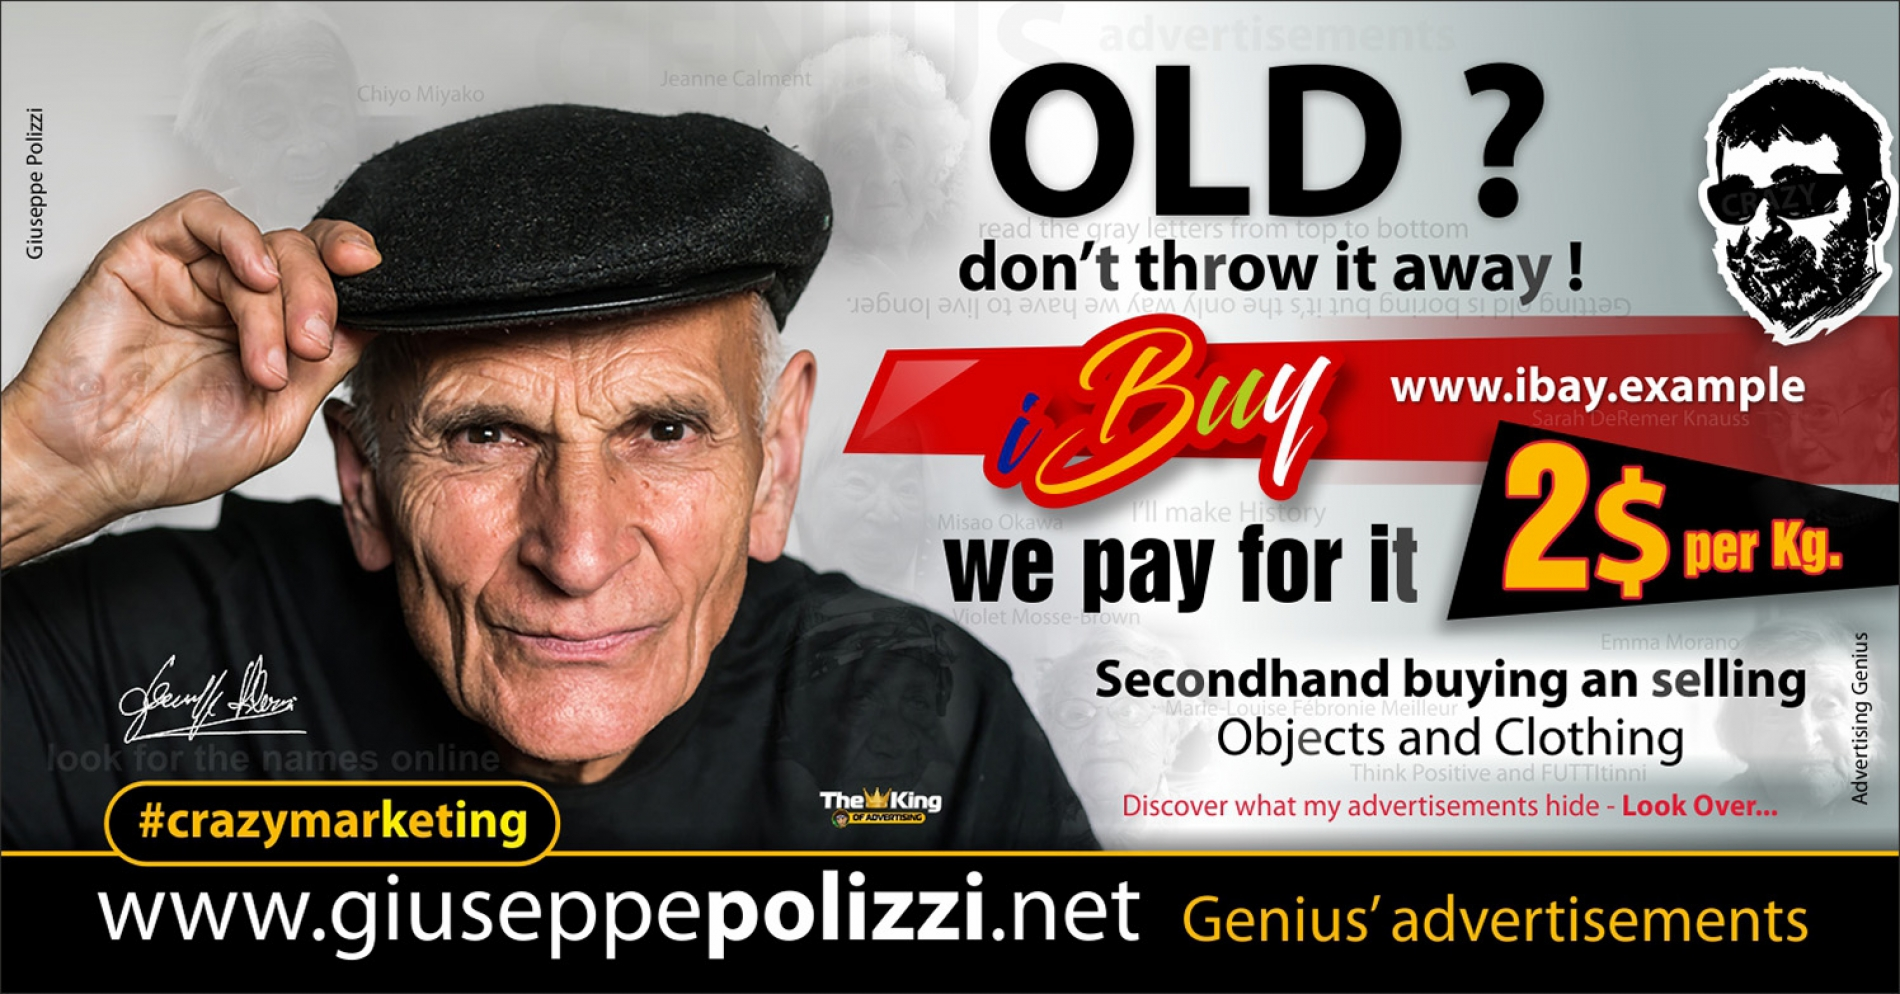 giuseppe polizzi crazymarketing OLD genius advertisements